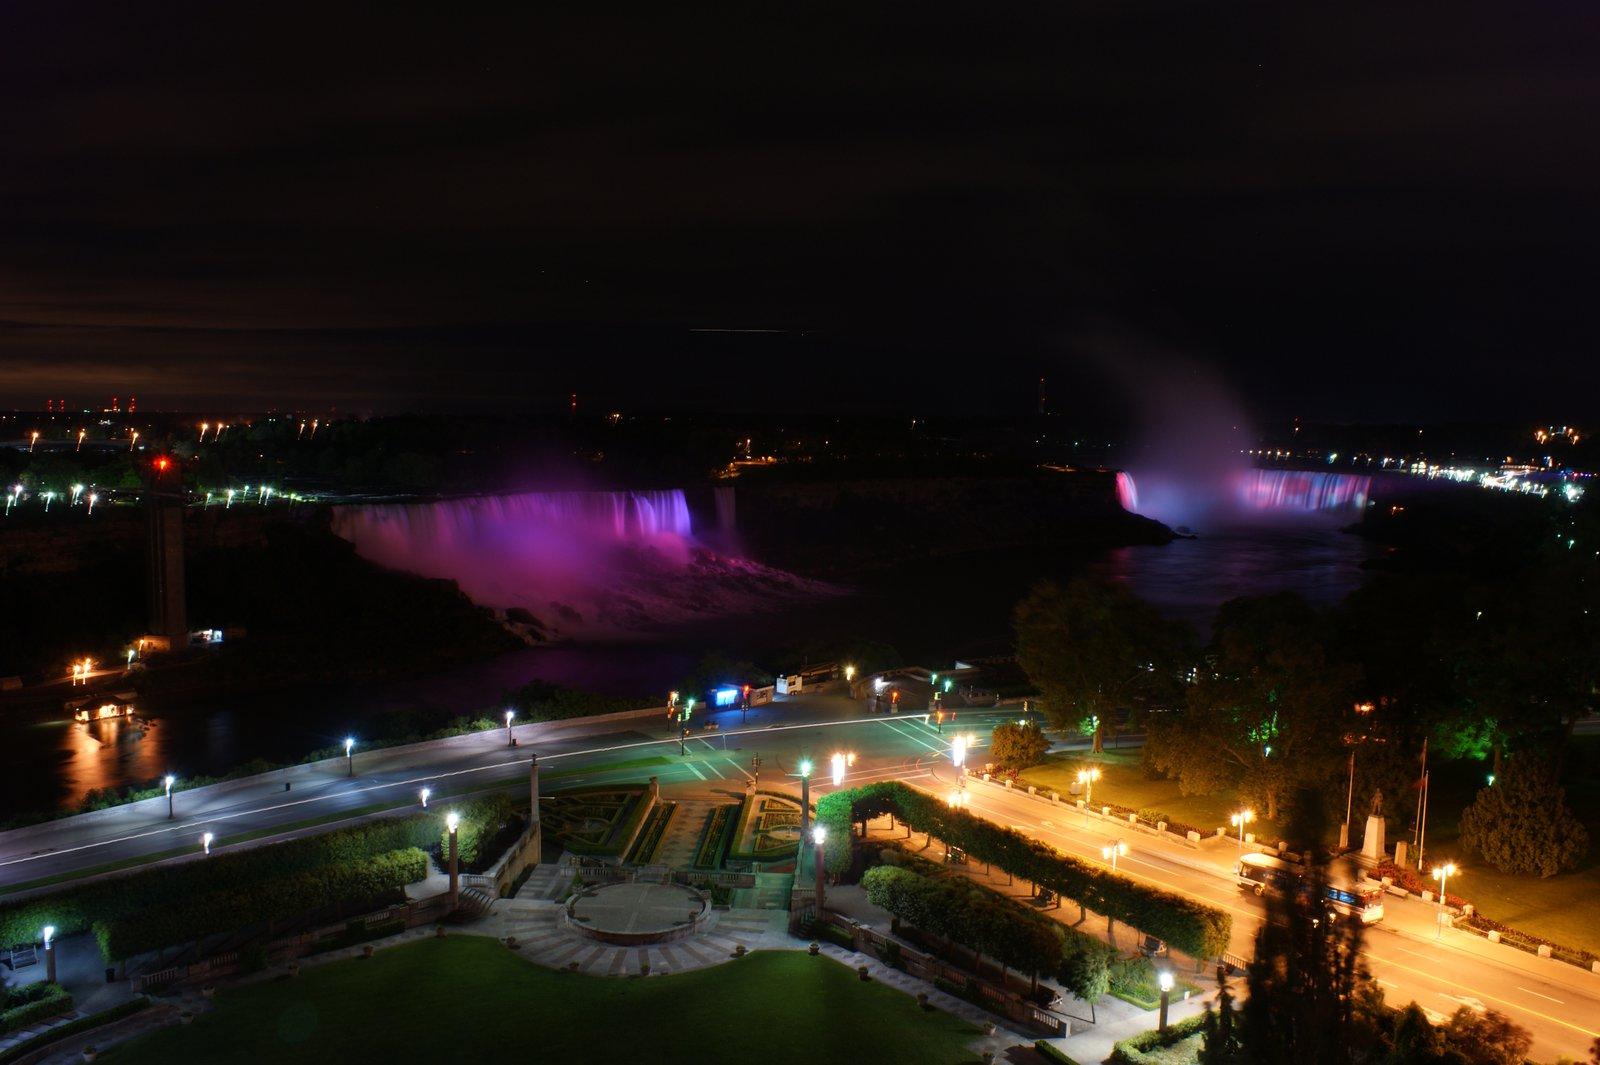 Niagara falls from hotel view